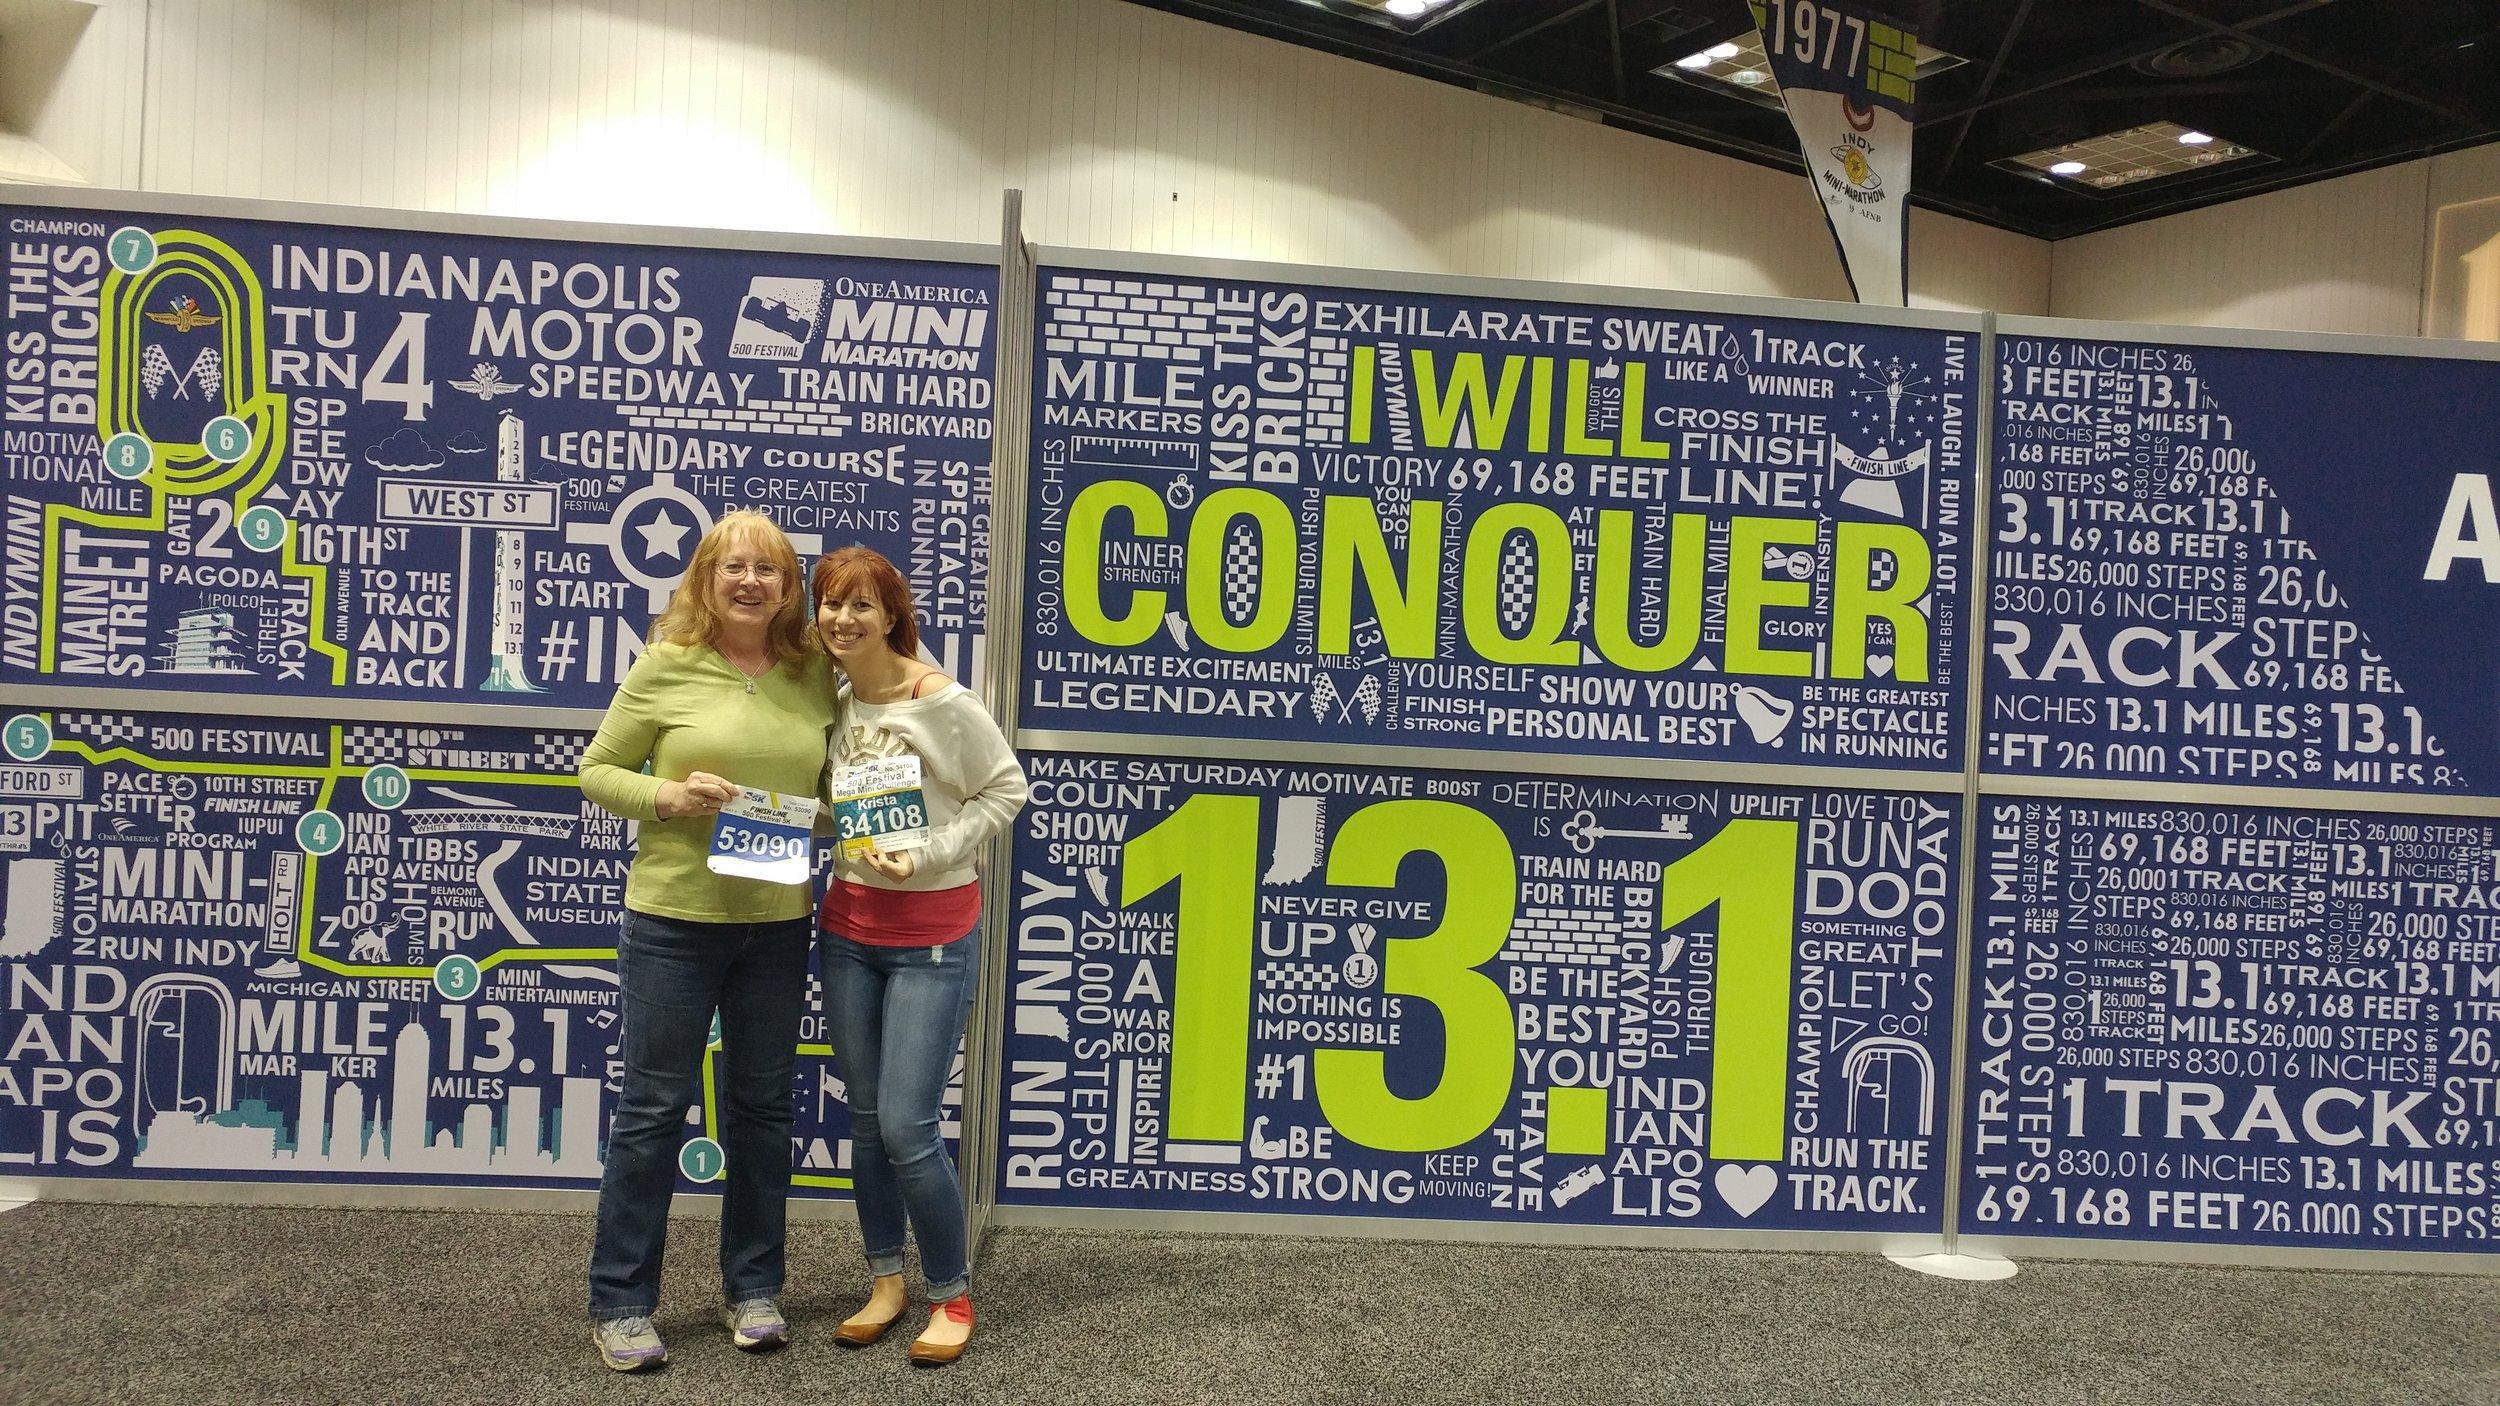 My mom & I at the race expo. She did the 5K and I did the Mega Mini Challenge (5K + half)